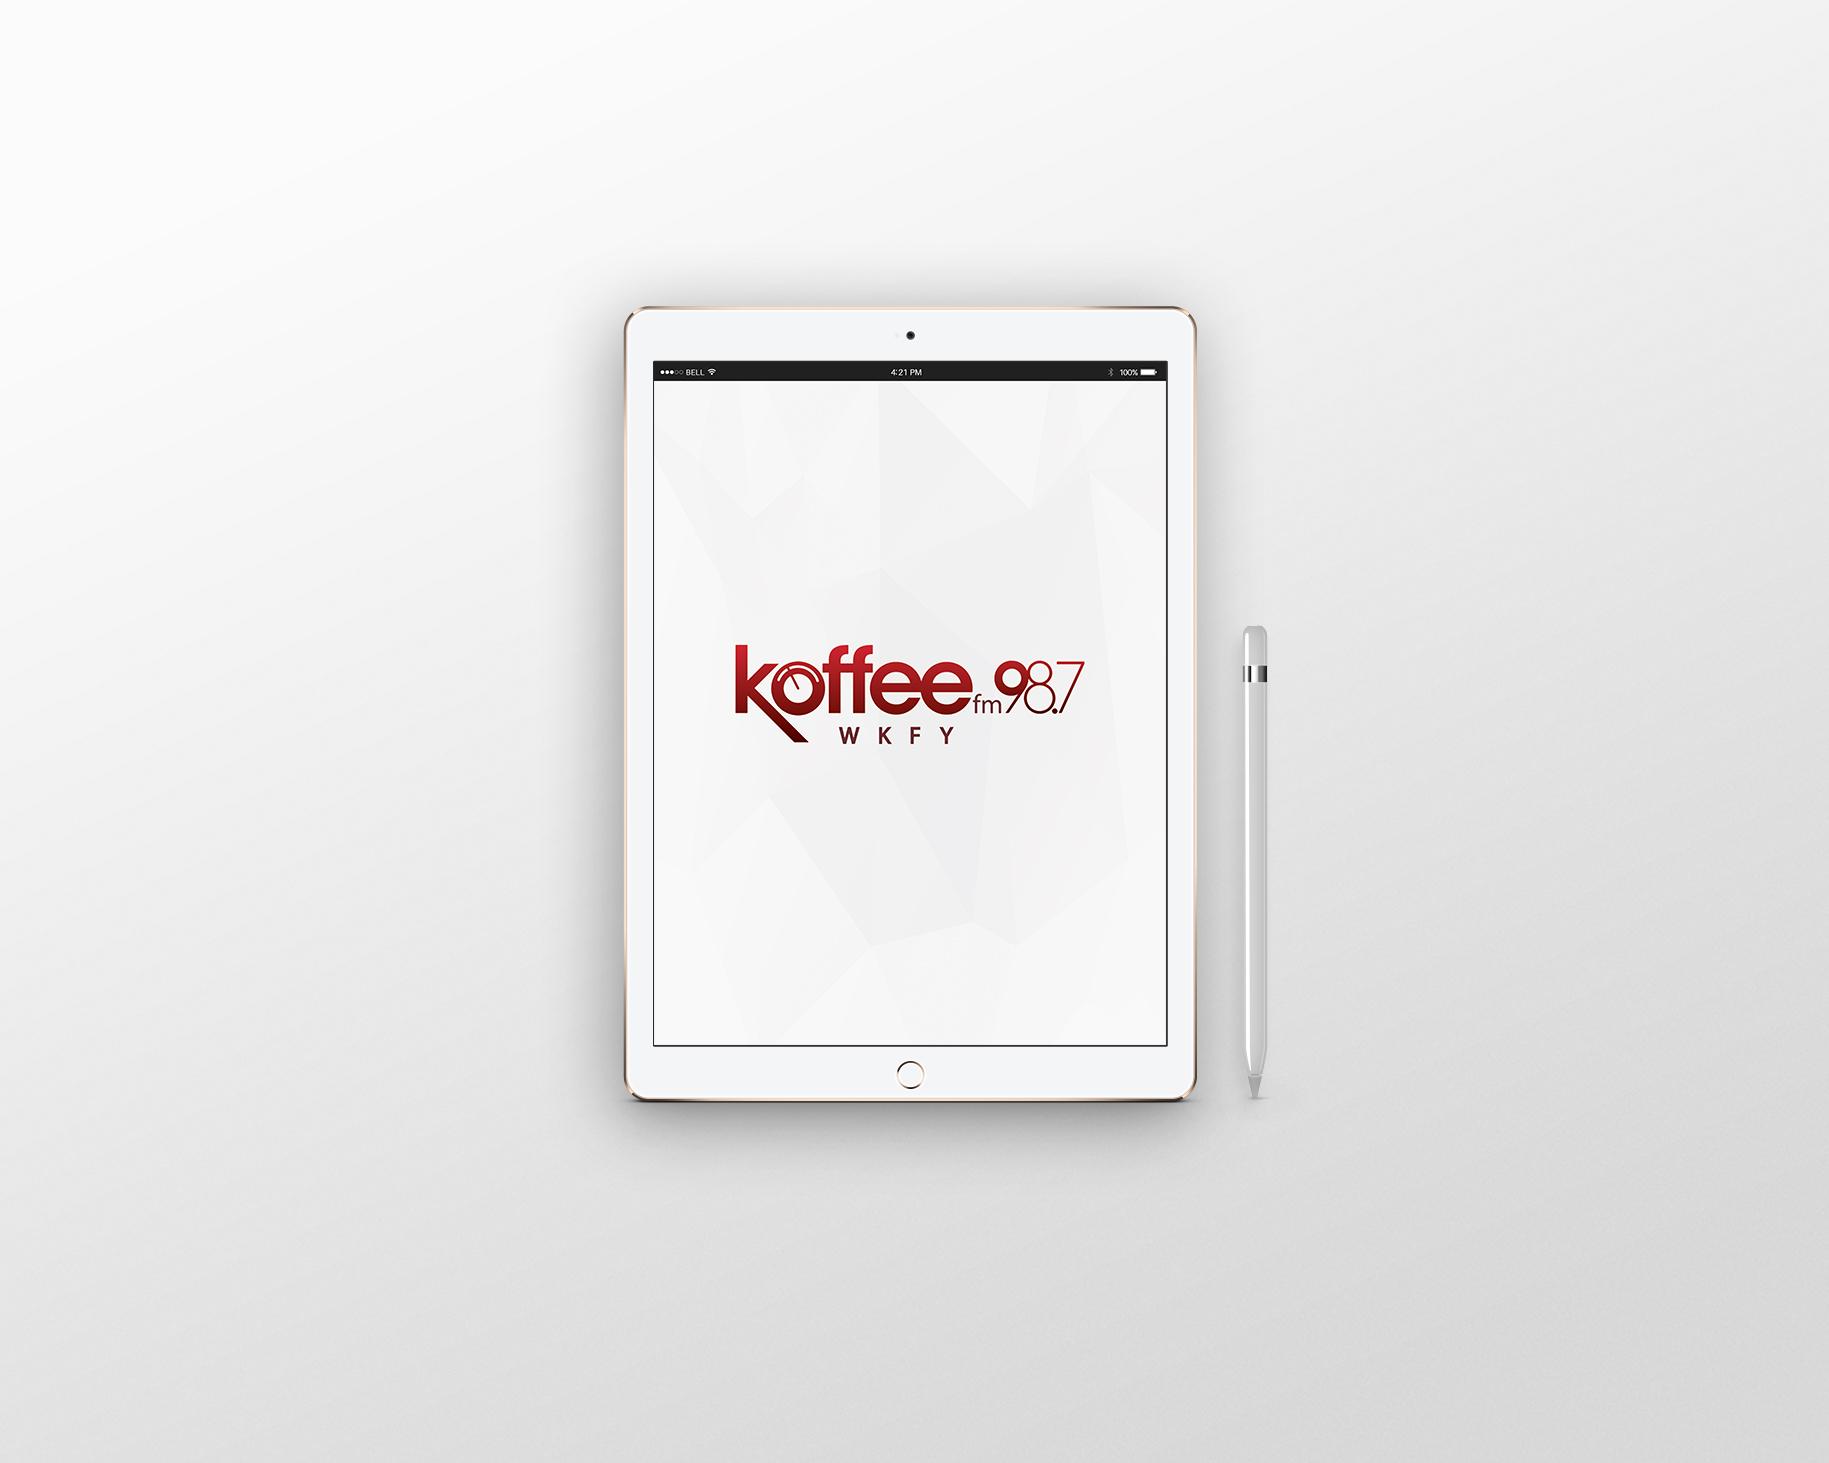 koffee.jpg